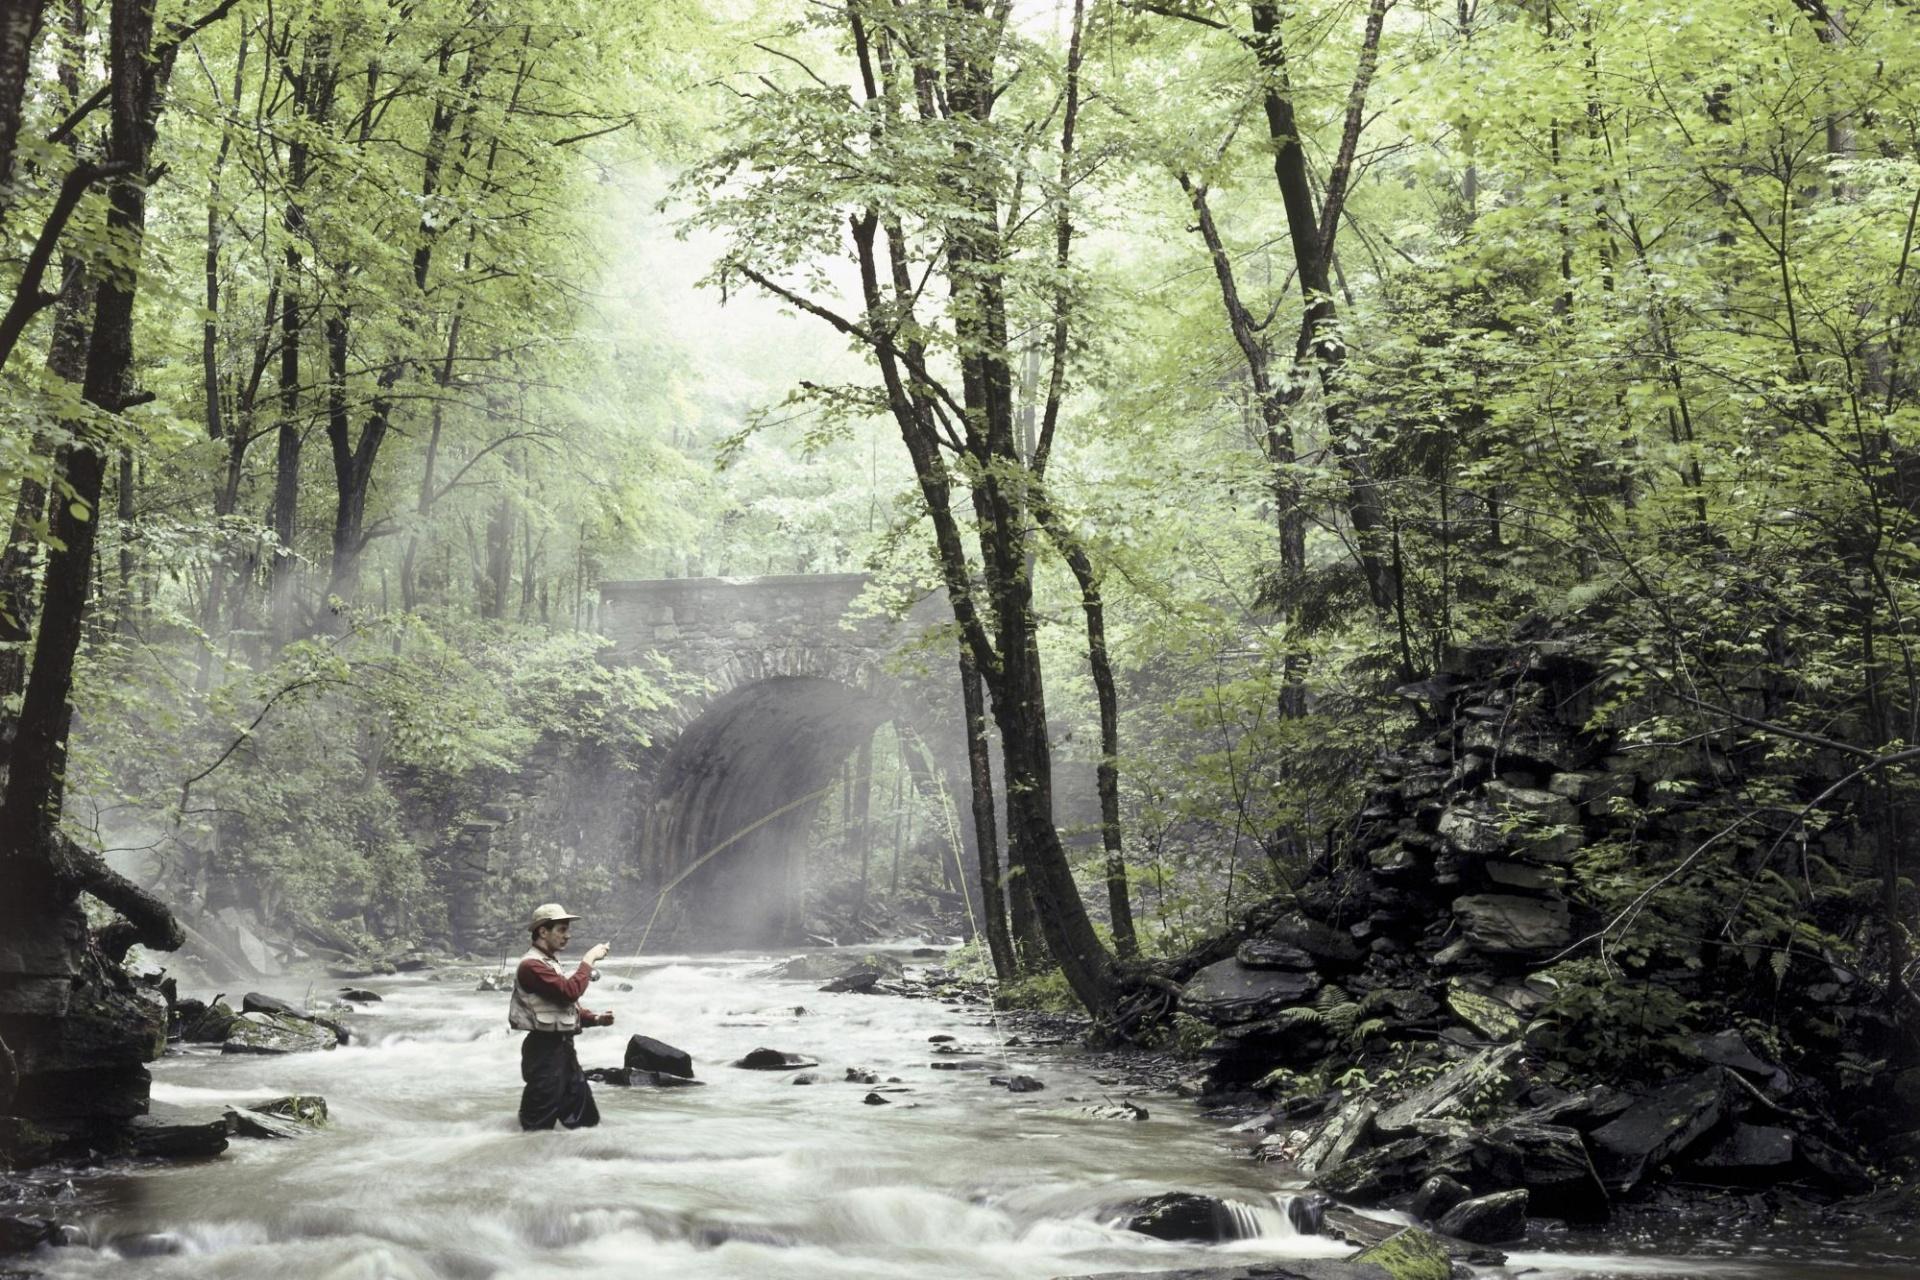 1920x1200 Fishing in the river desktop PC and Mac wallpaper 1920x1280